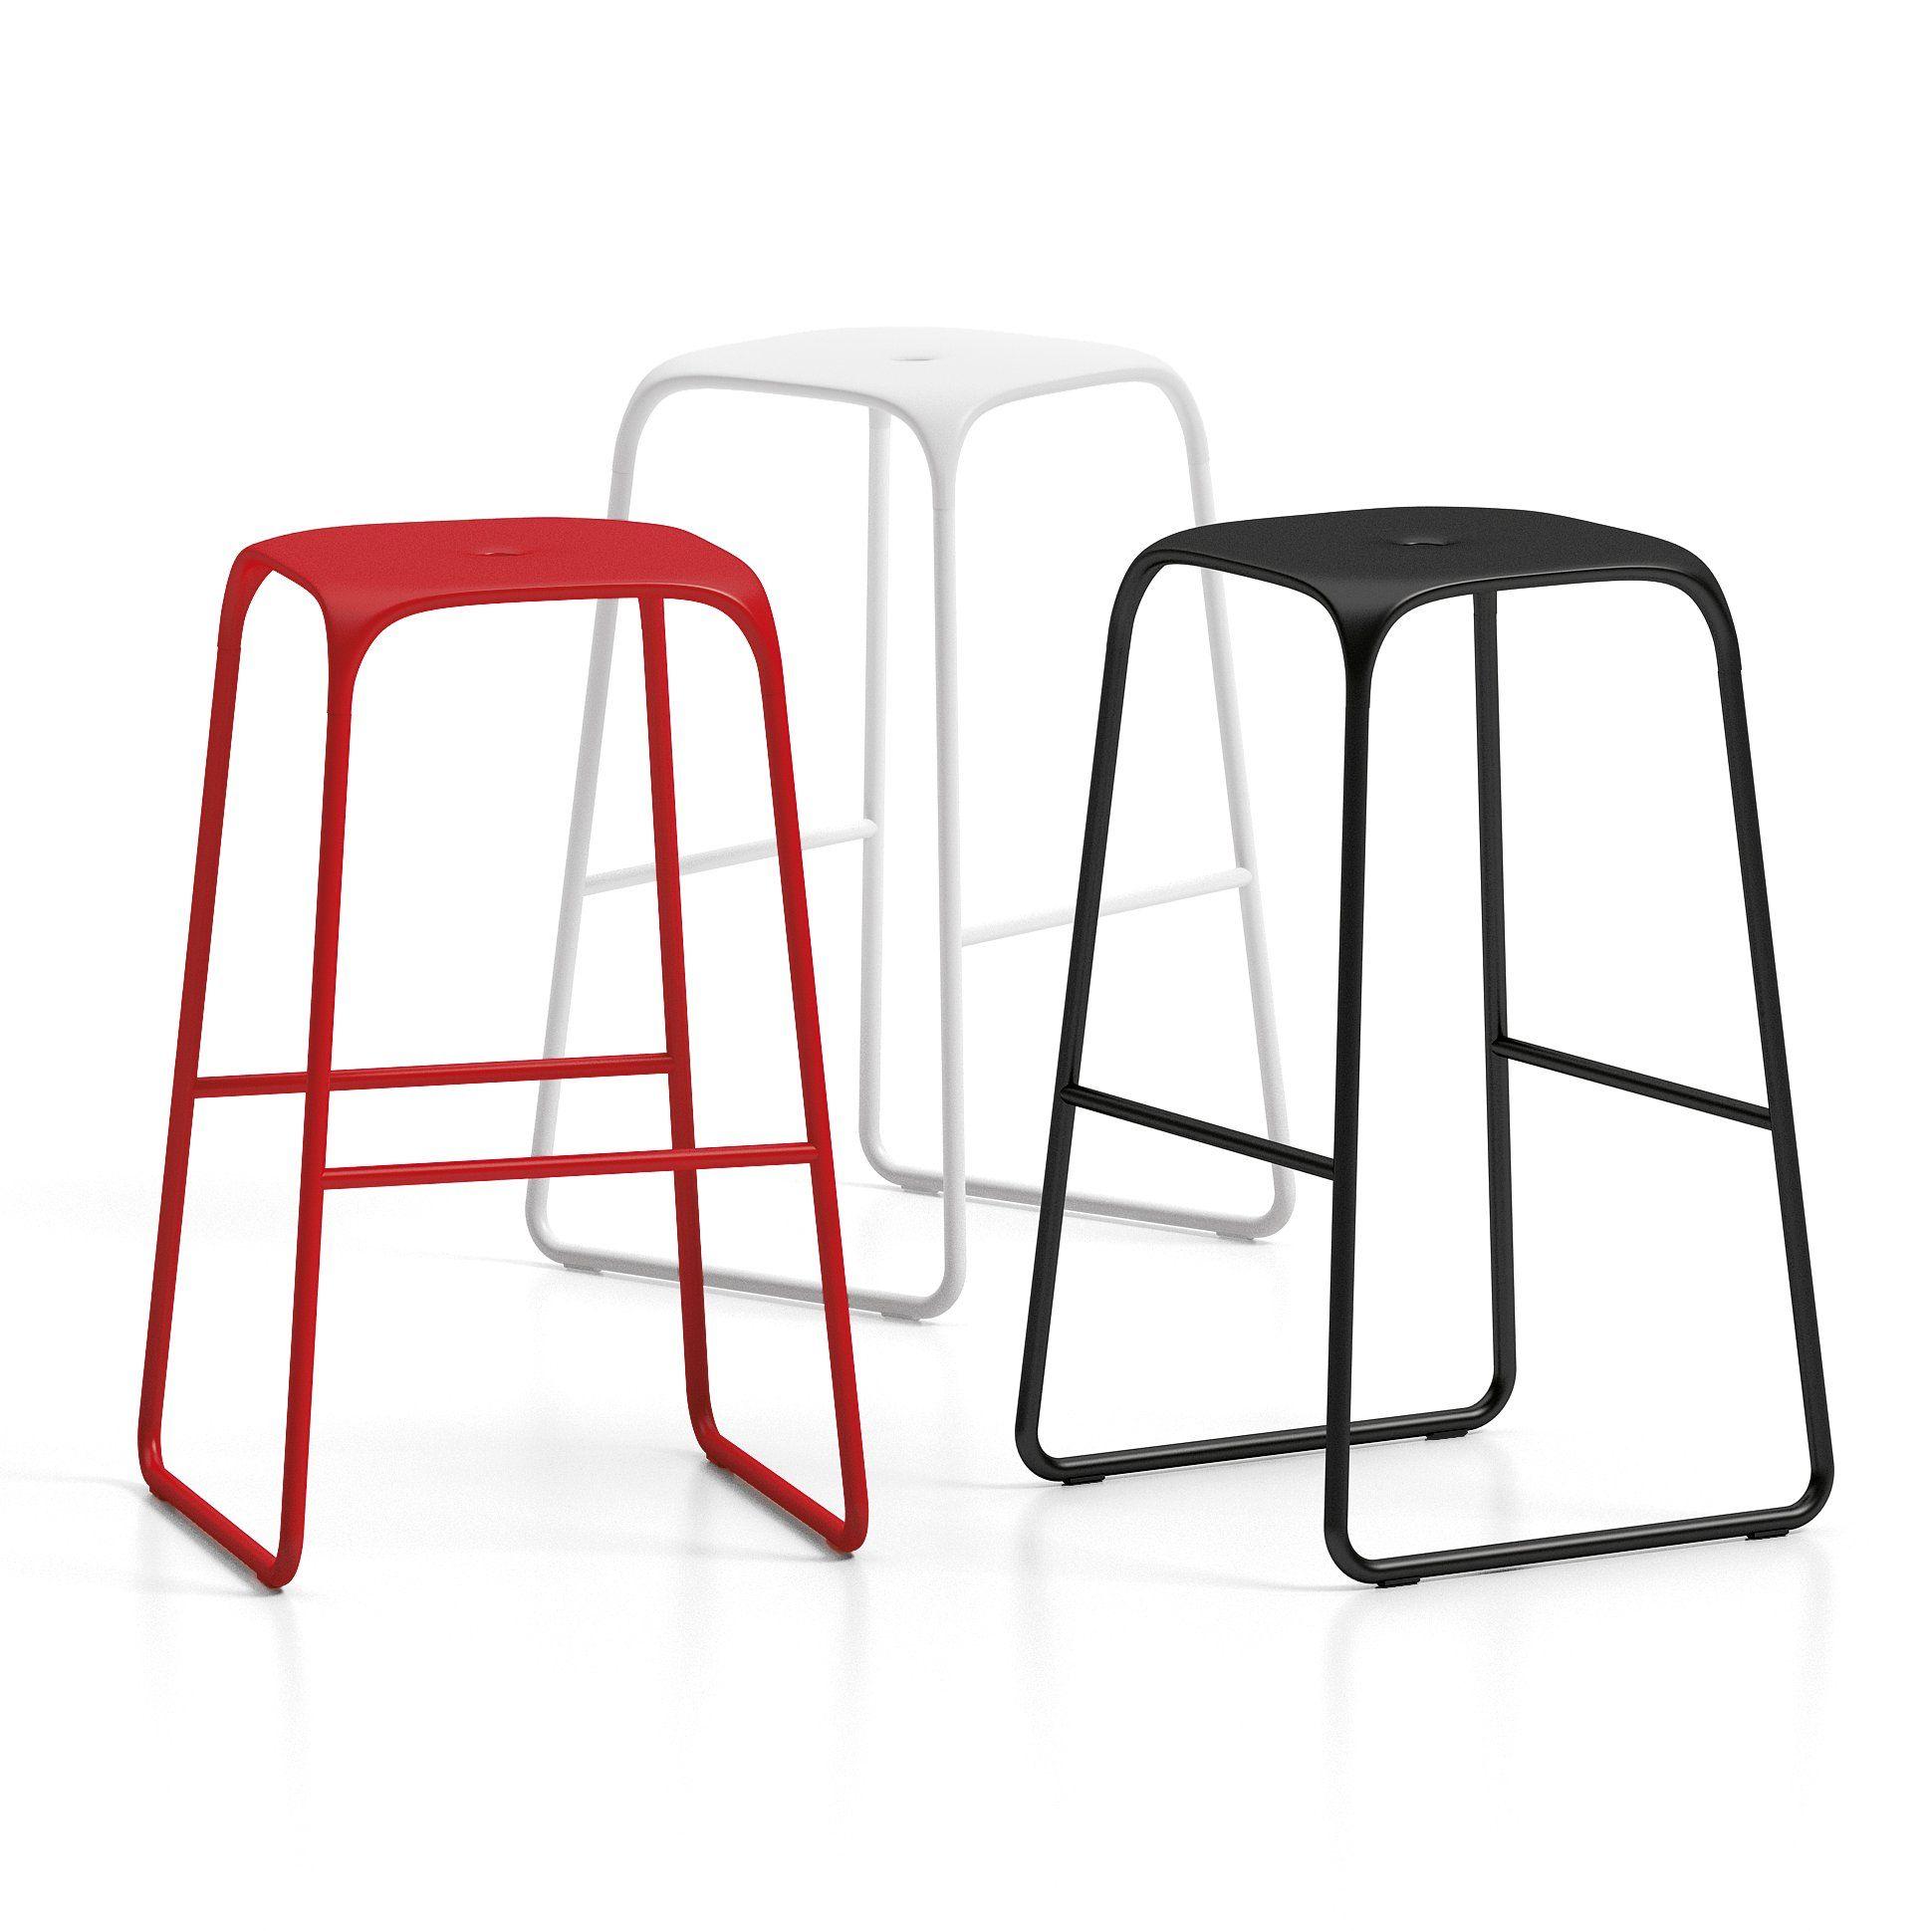 Bobo Infiniti minimalistic modern kitchen stool in steel frame and ...